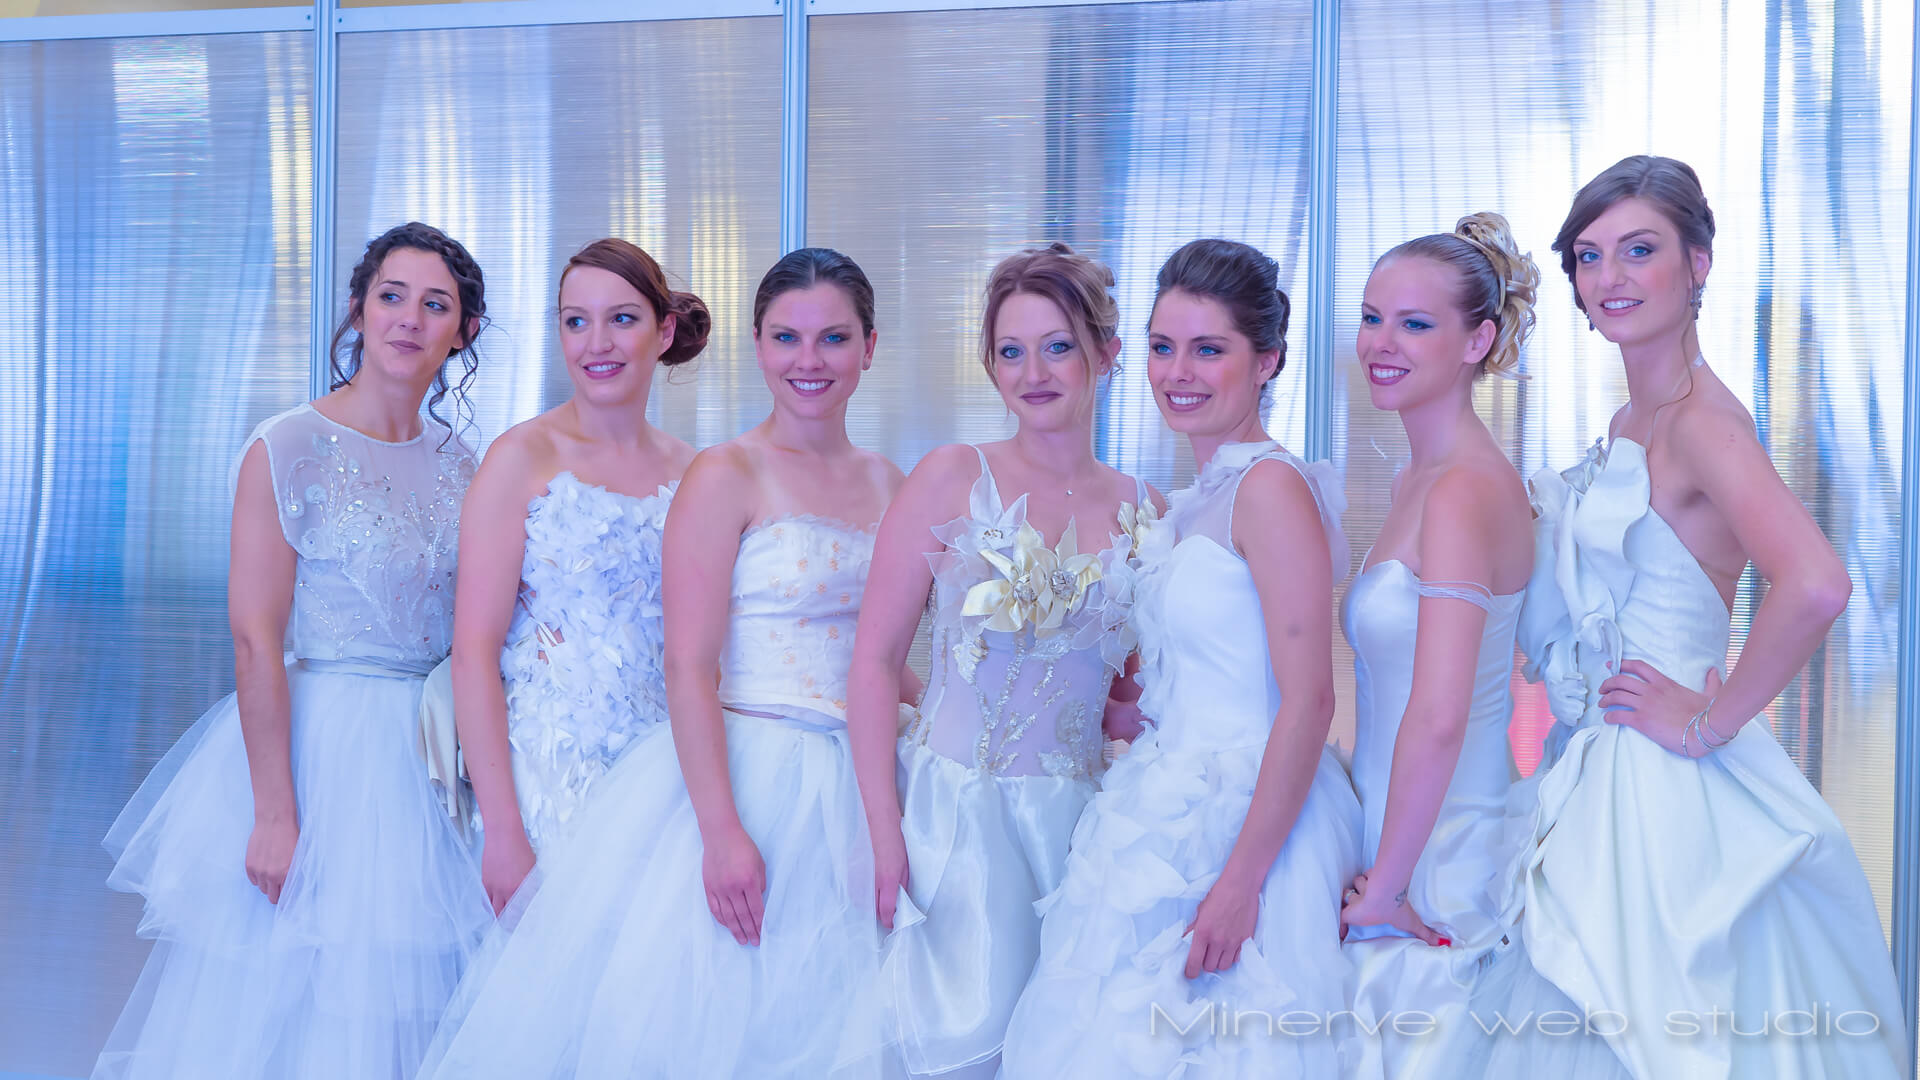 Robes mariées Elena Viette - Minerve web studio